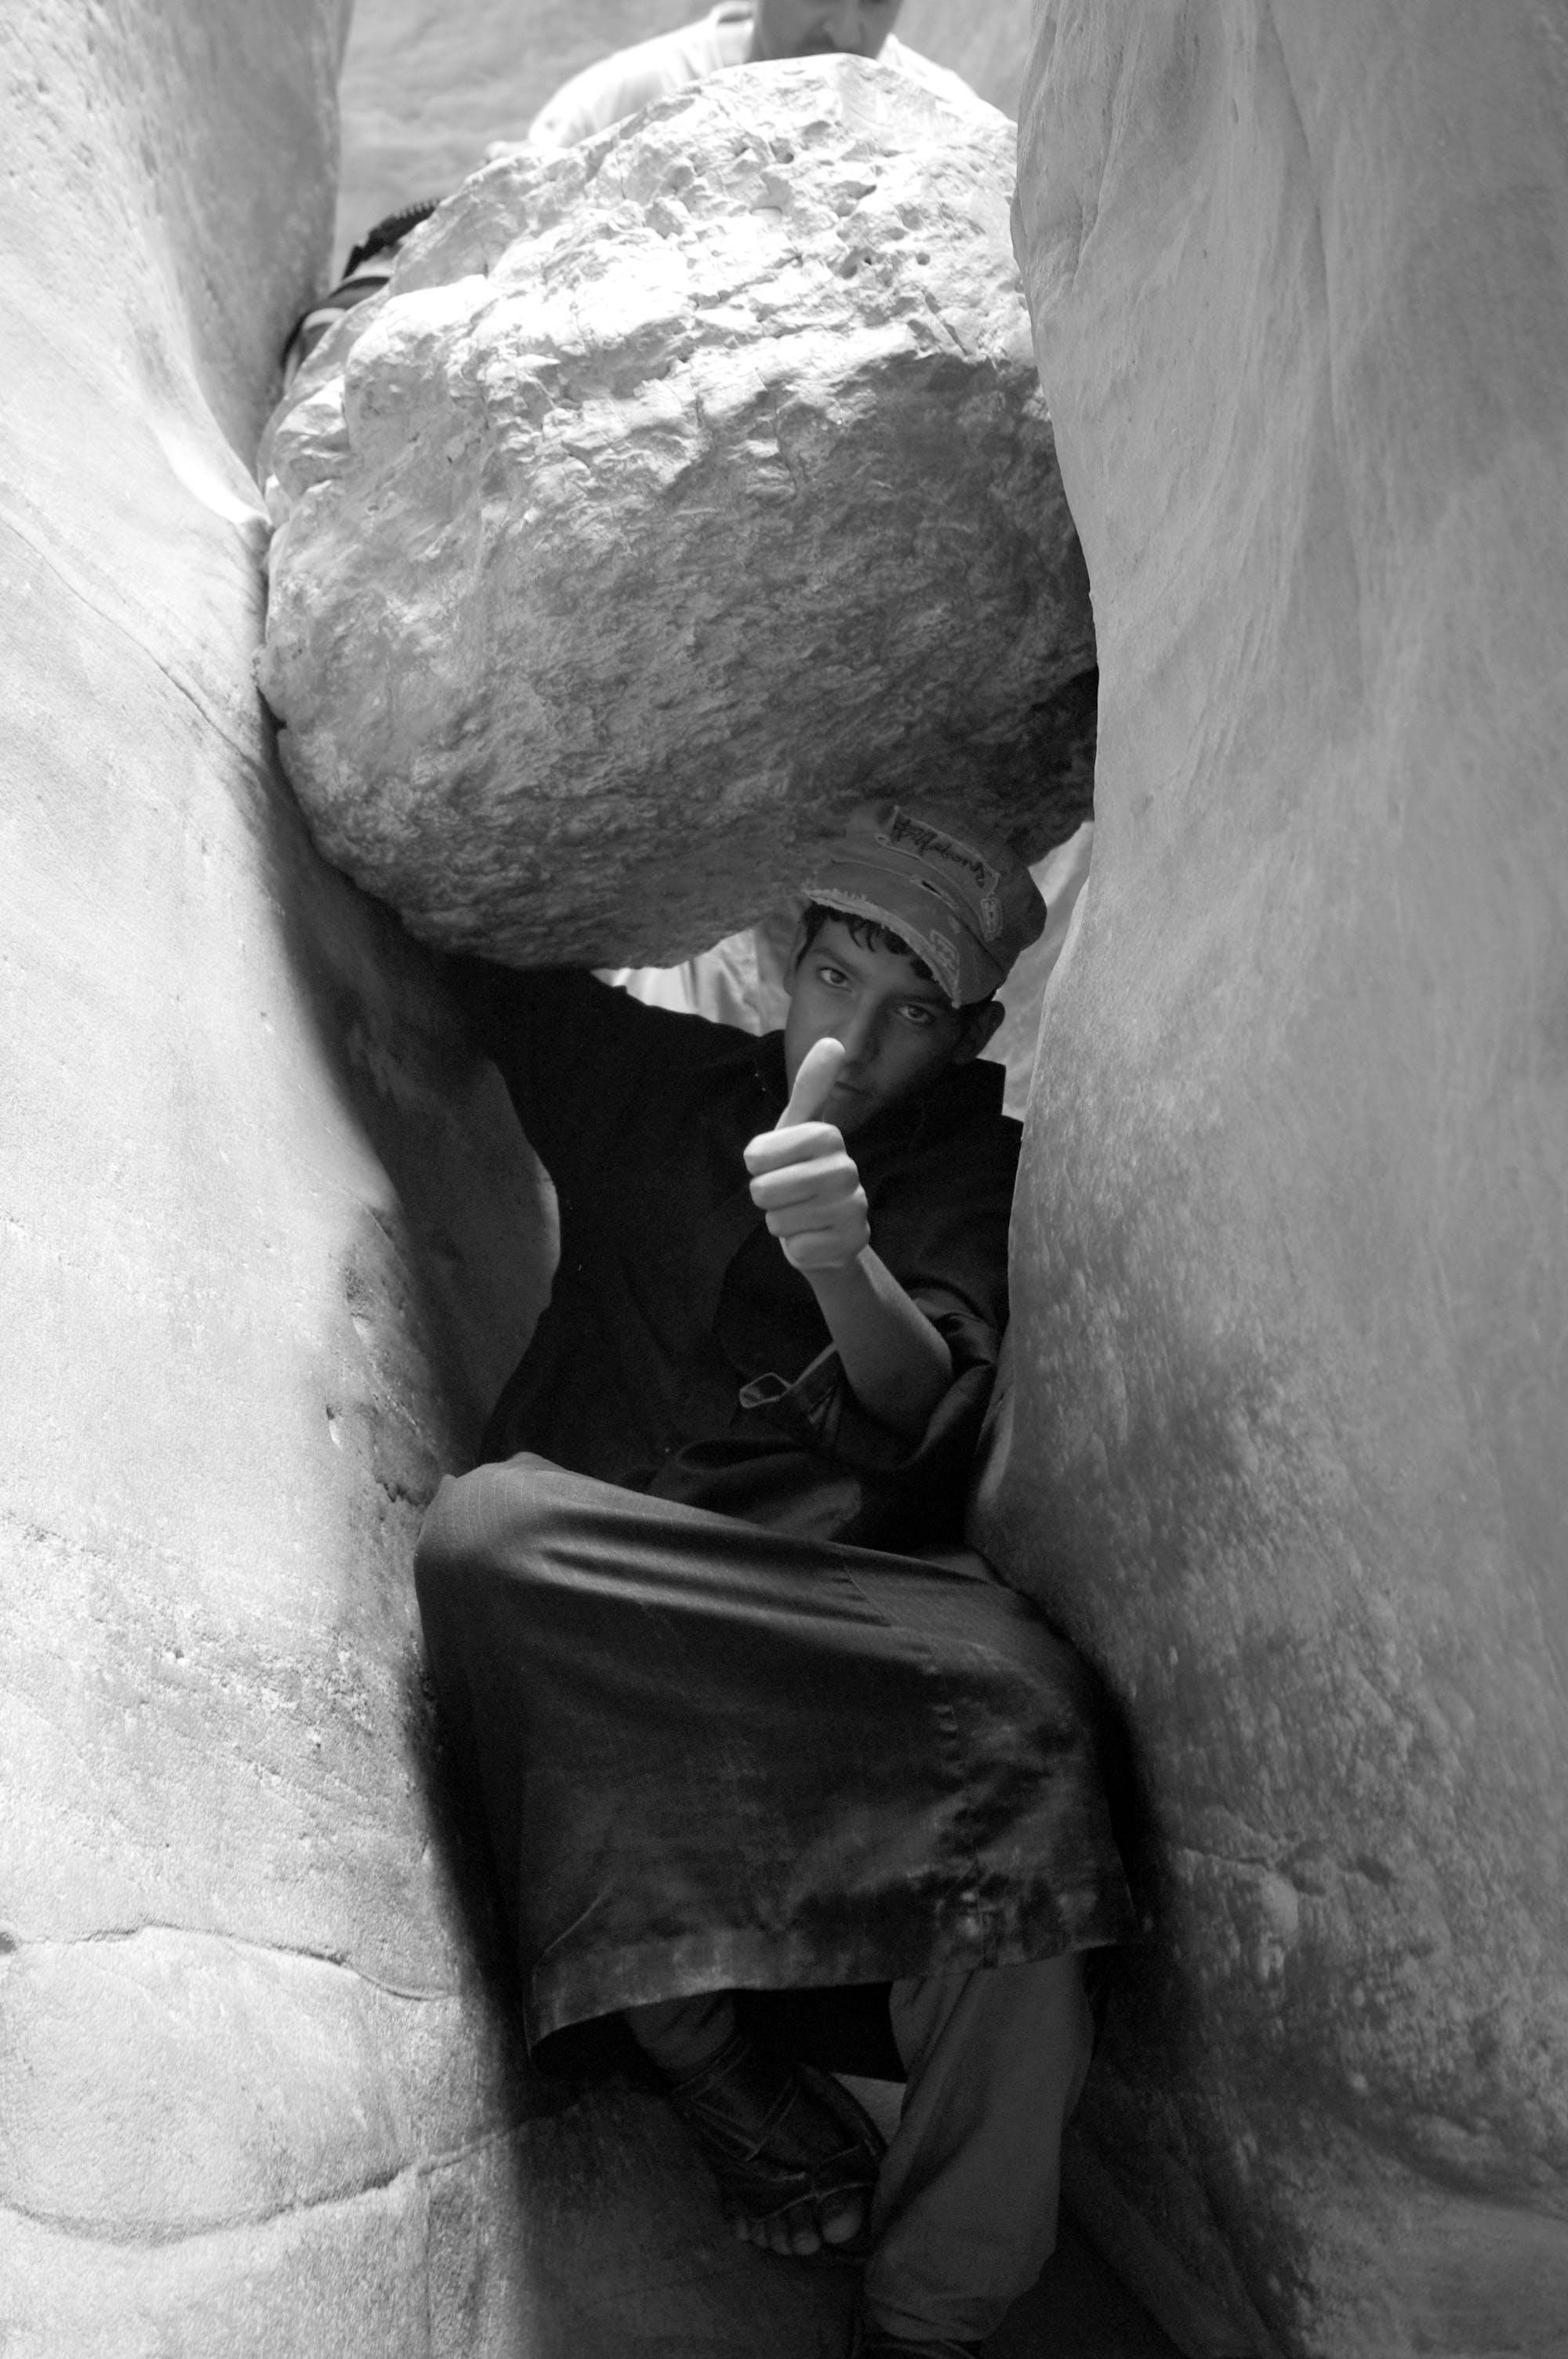 Free stock photo of black and white, canyon, desert, jordan boy